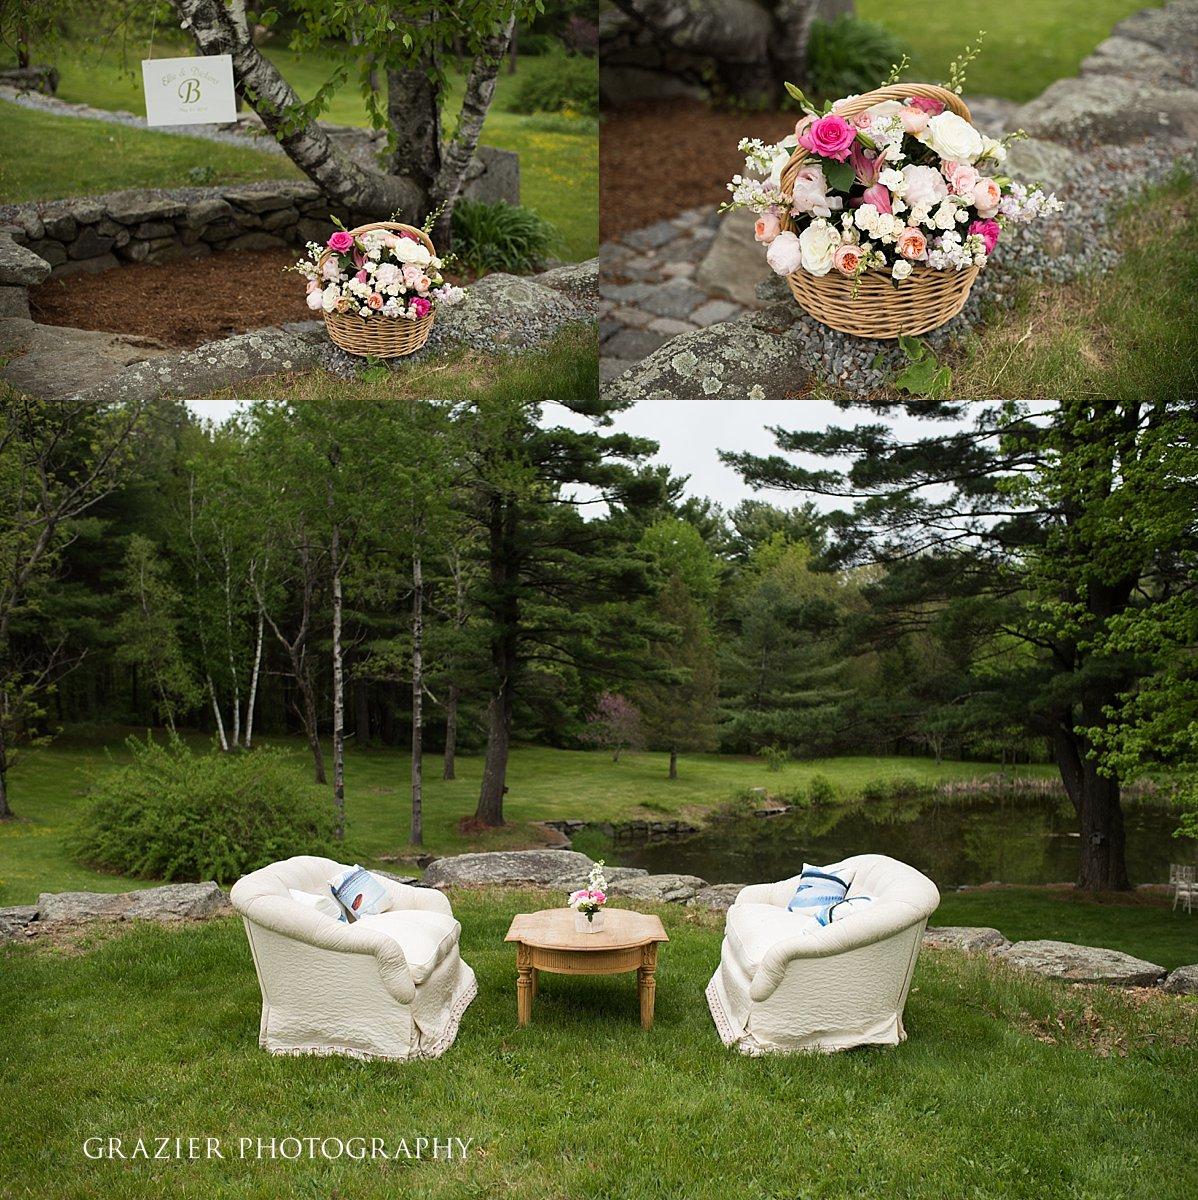 0698_GrazierPhotography_Farm_Wedding_052016.JPG